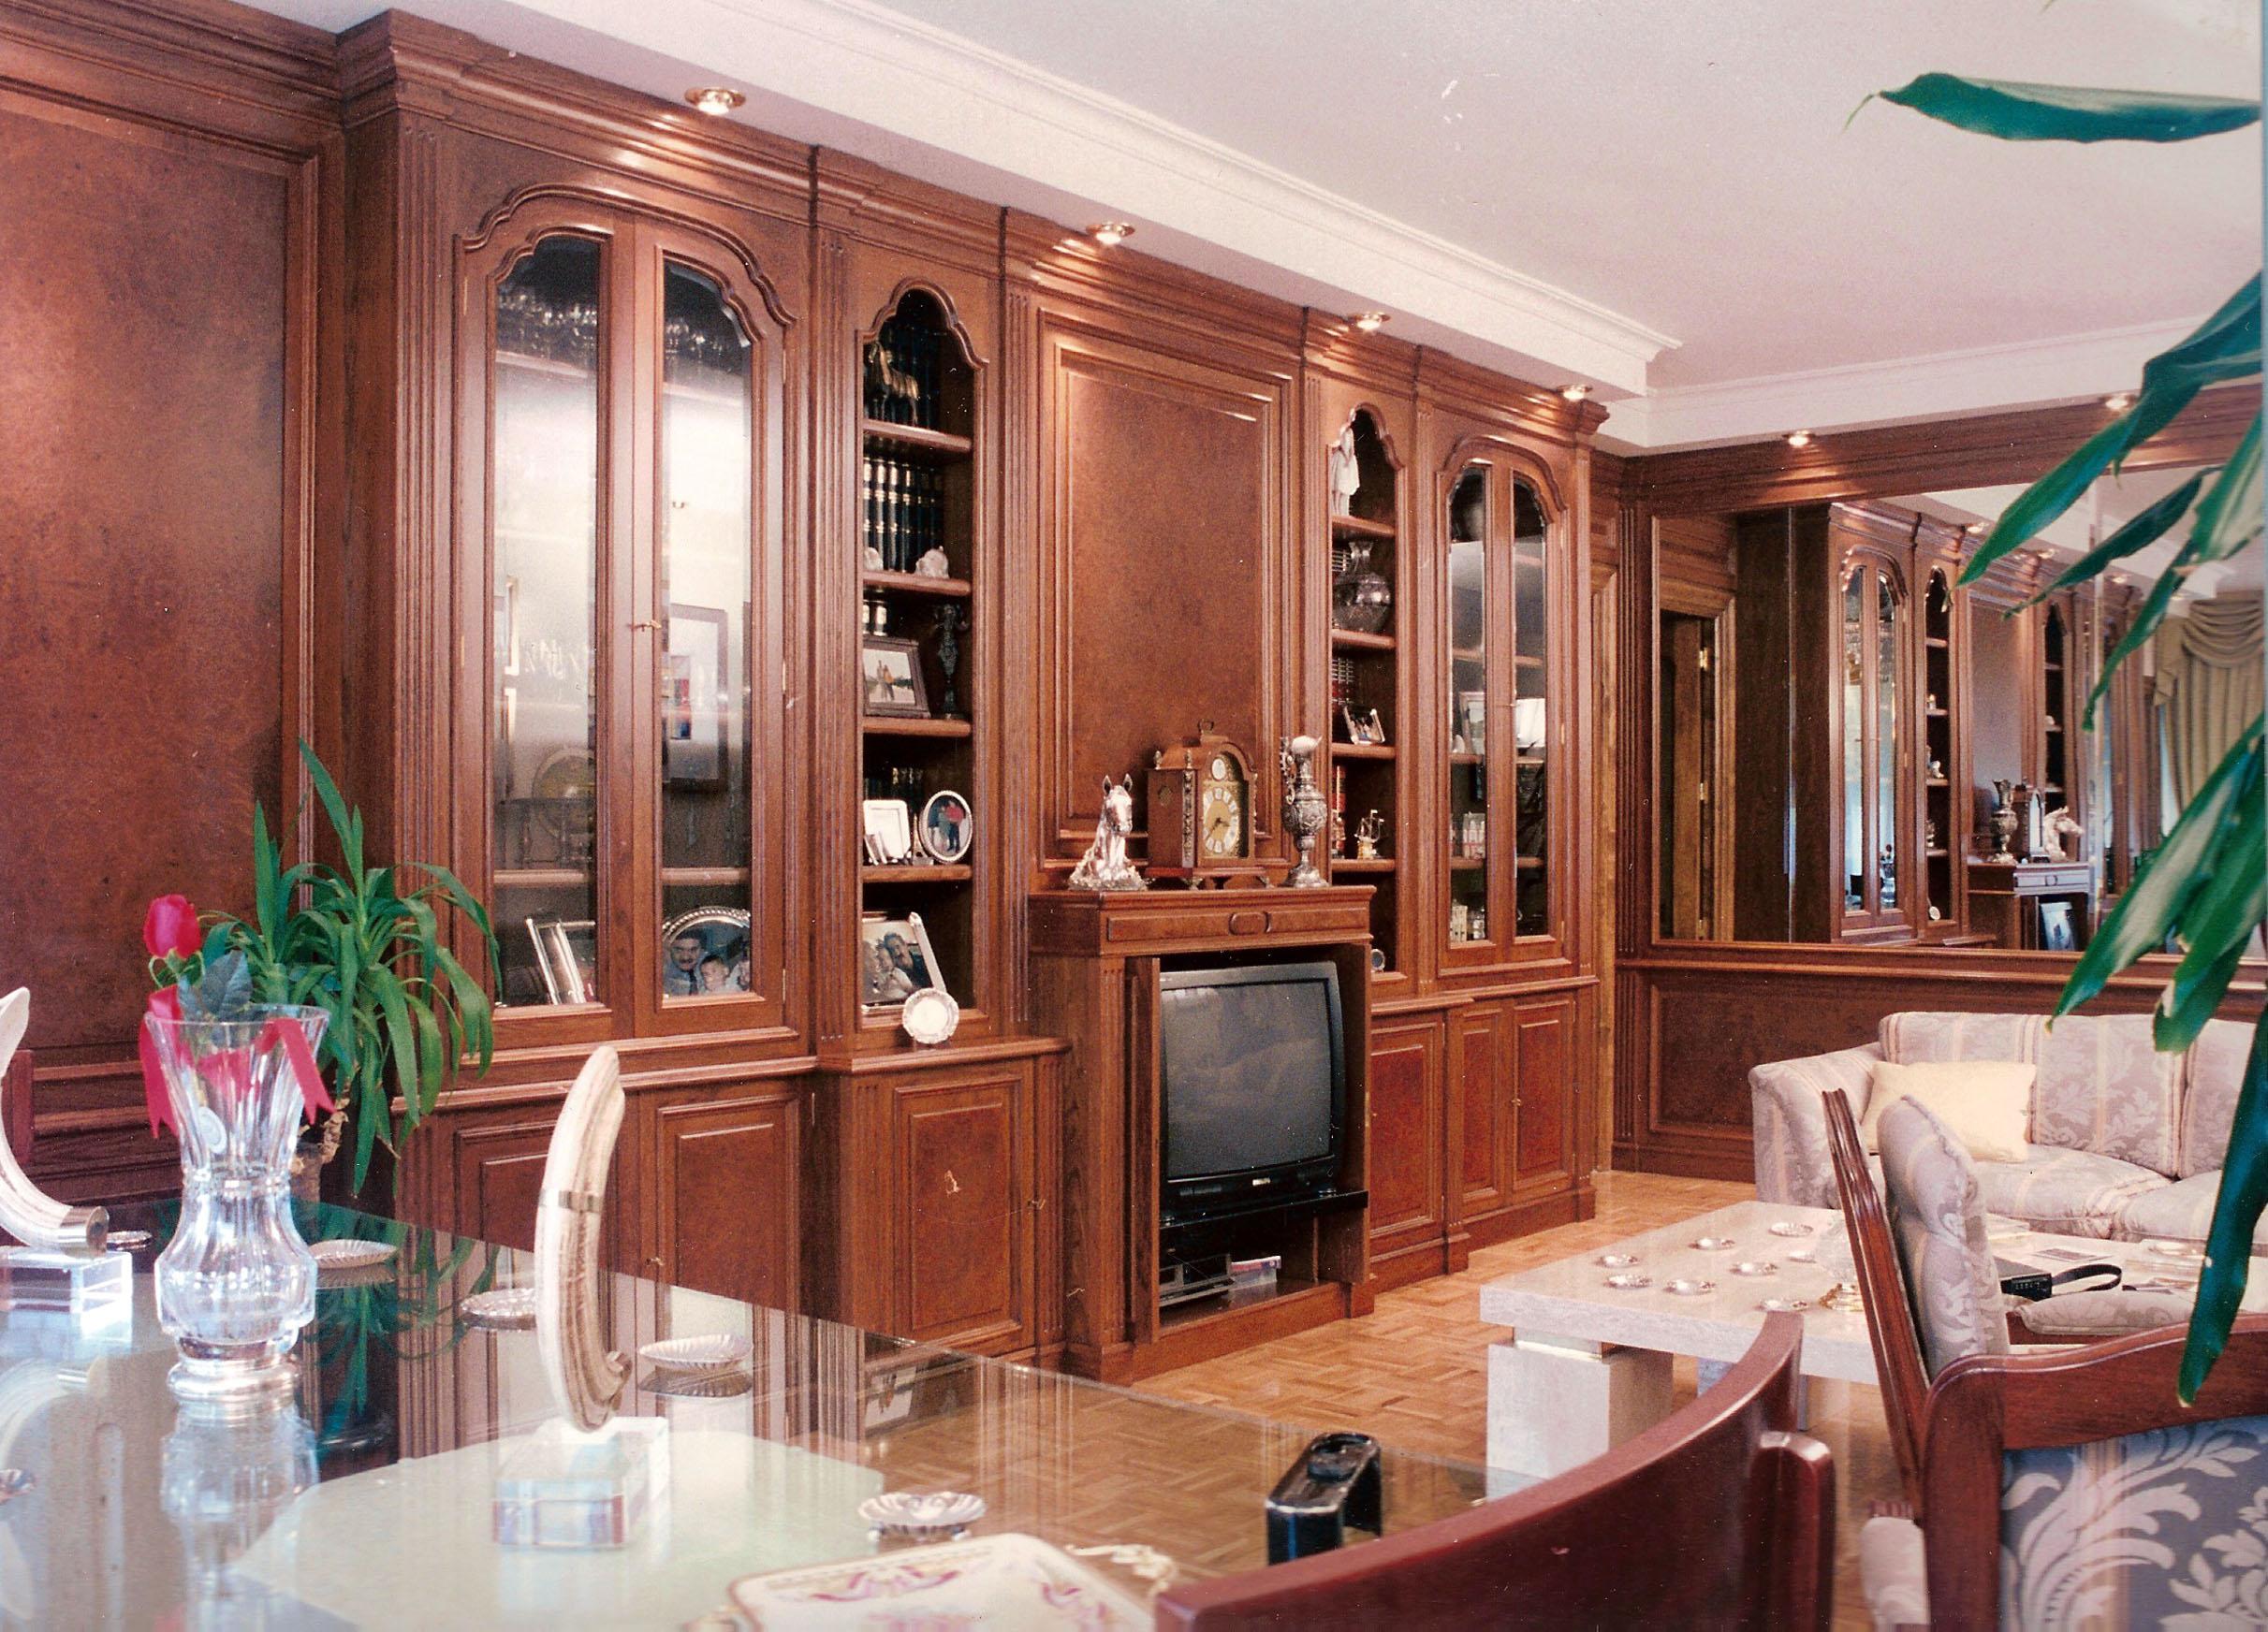 Mueble con chimenea perfect mueble para tv y chimenea - Muebles de chimenea ...